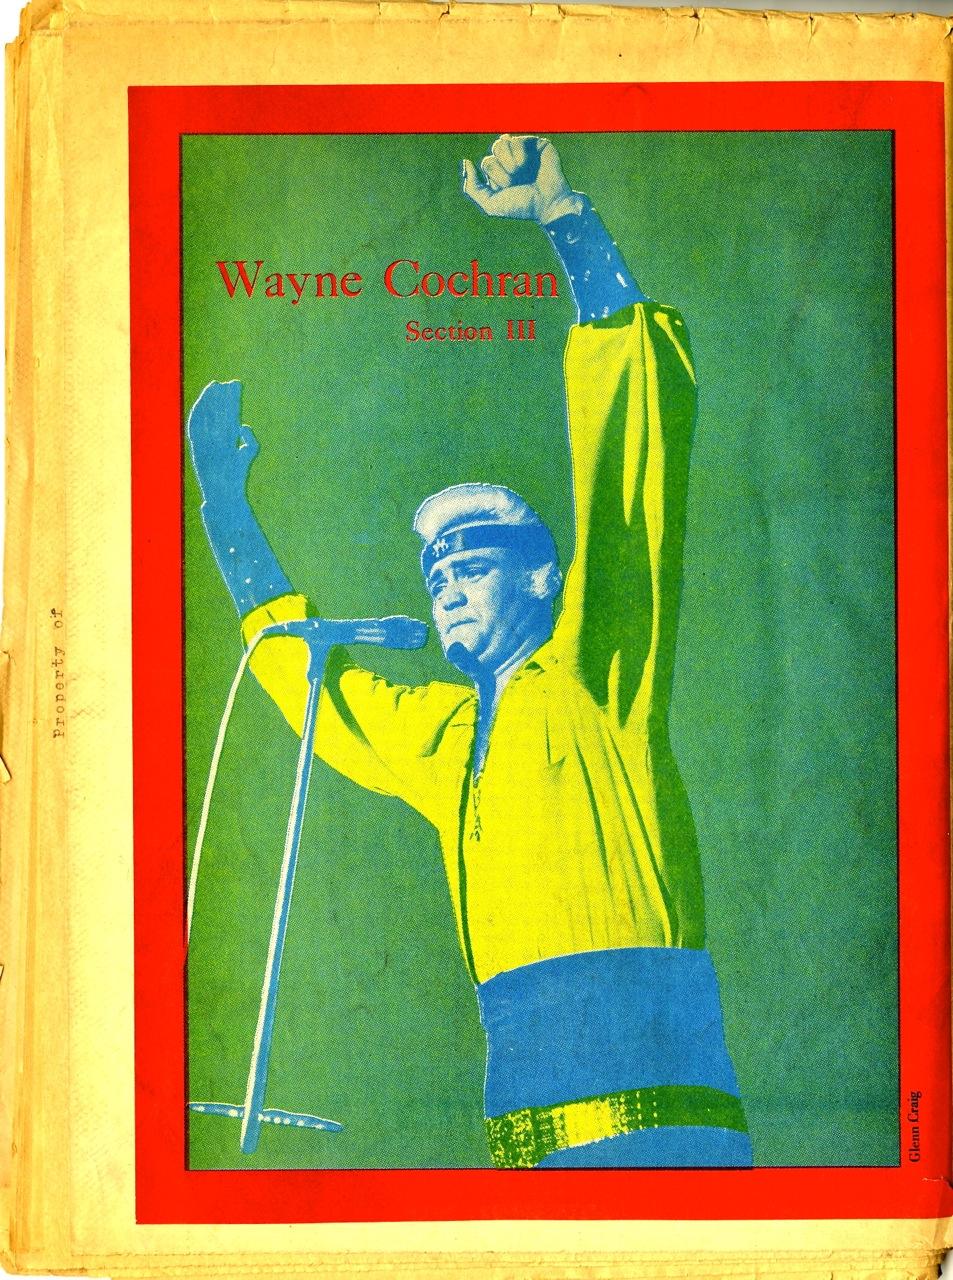 Zygote_v1_n7_1970_Southern Folklife Collection